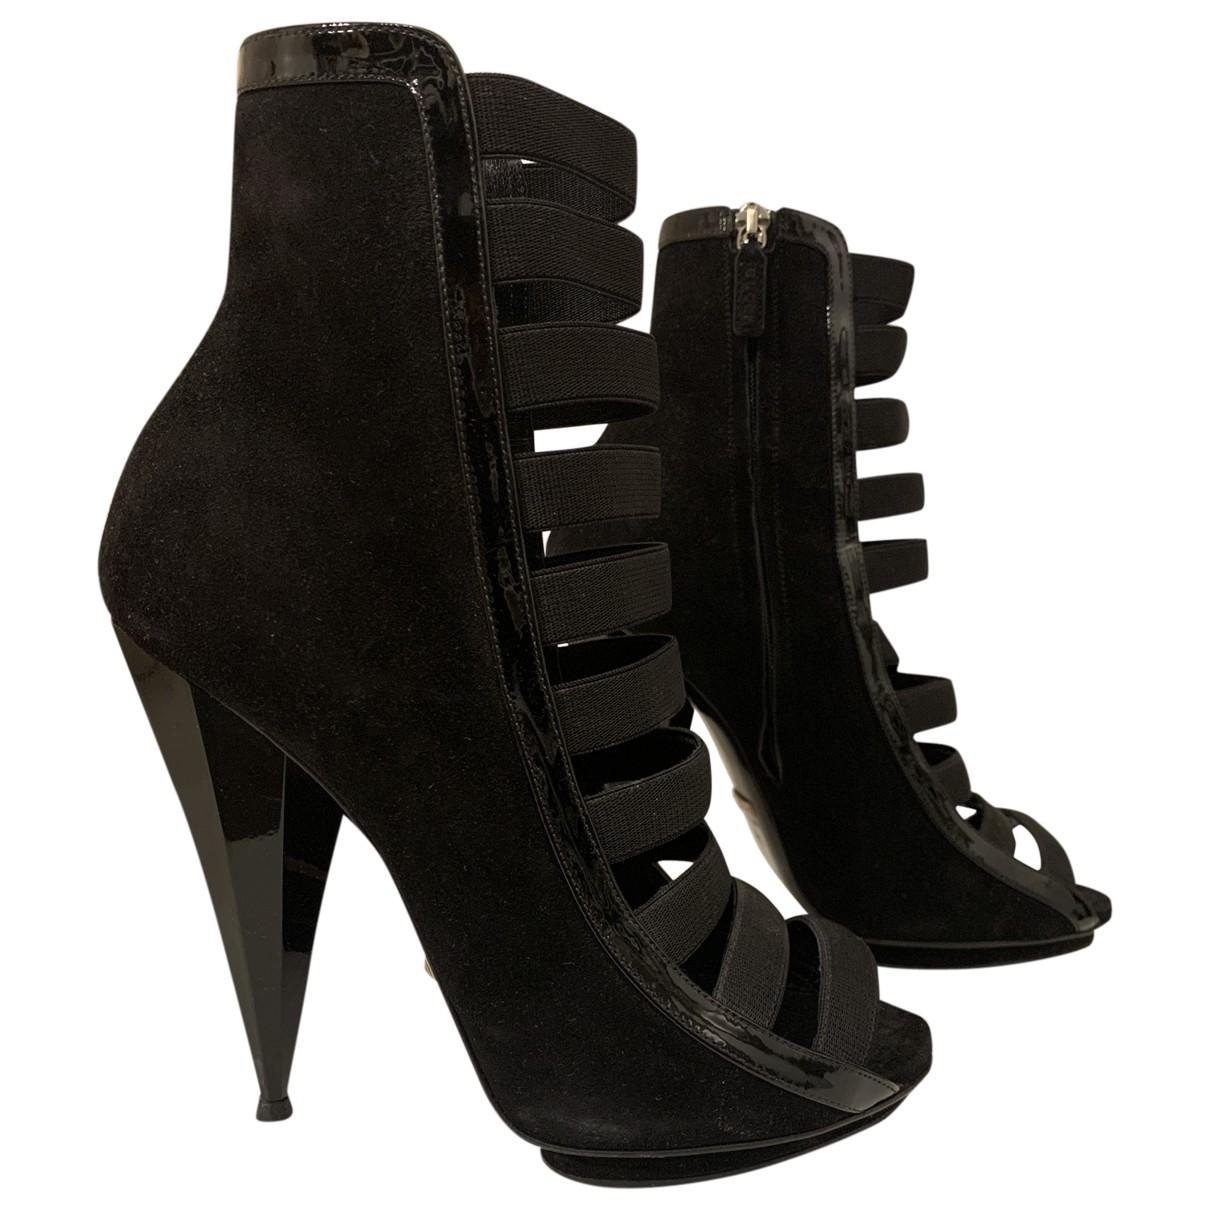 Gucci \N Black Suede Sandals for Women 38.5 EU